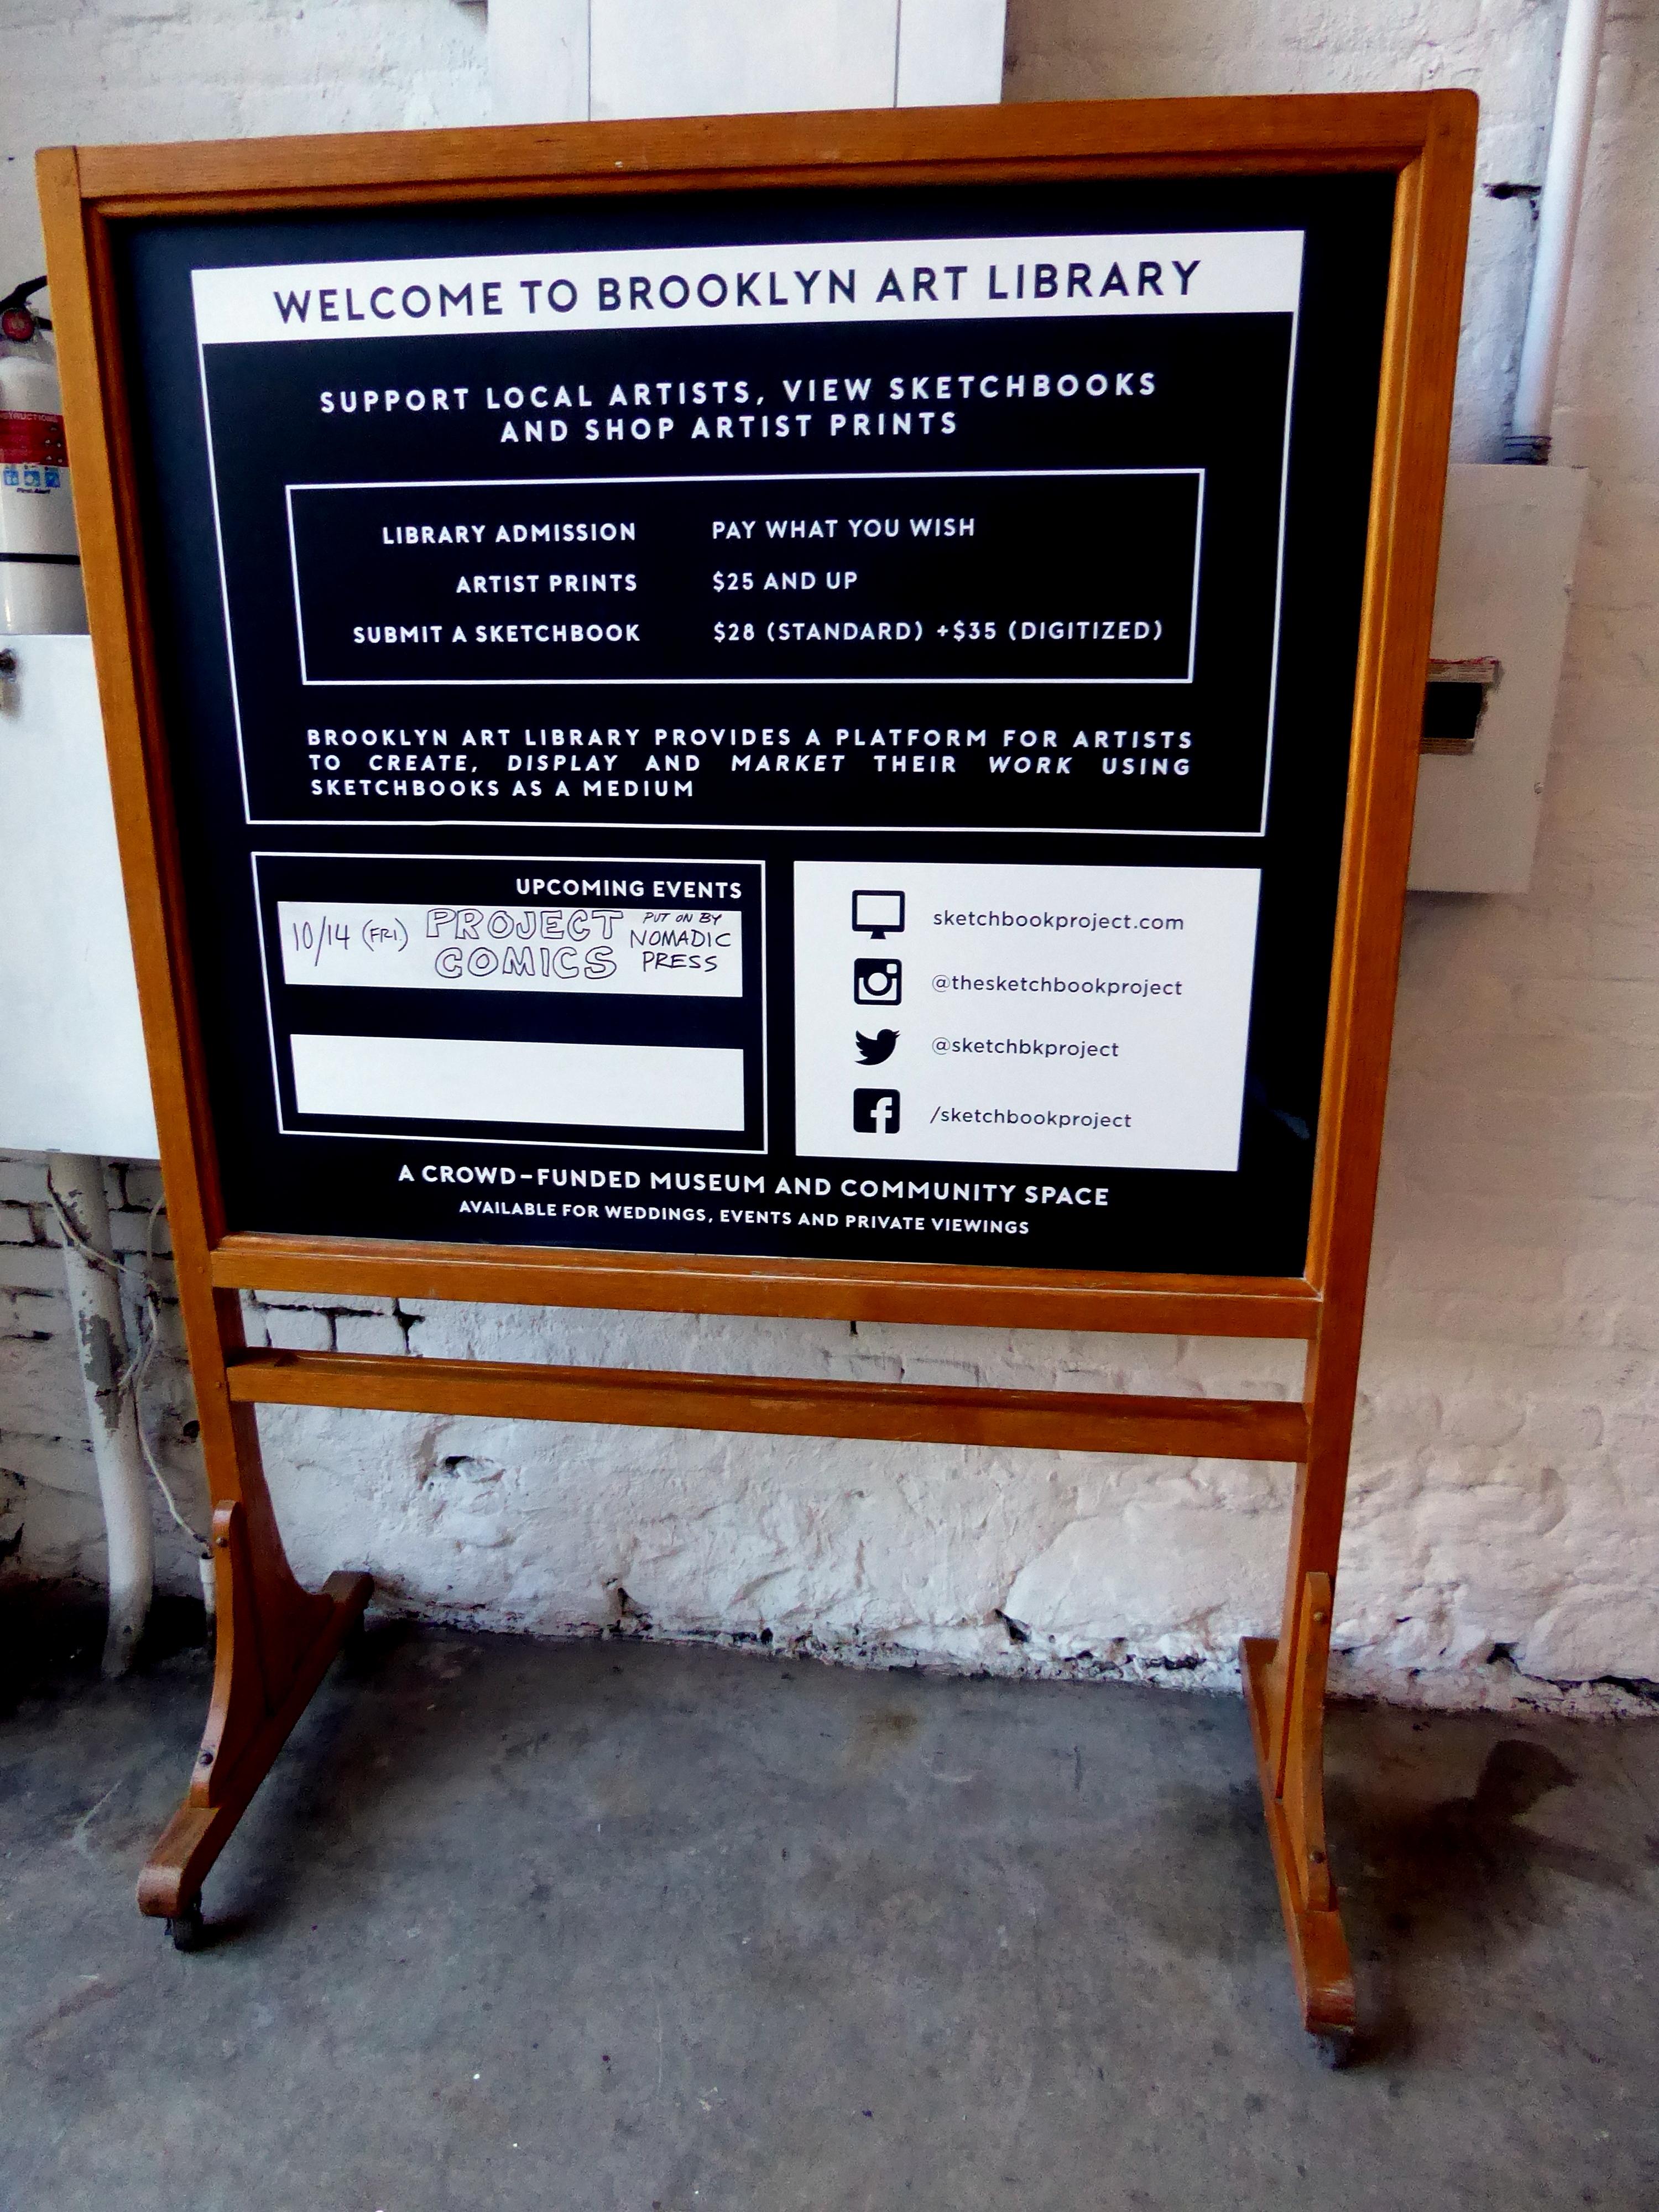 https://upload.wikimedia.org/wikipedia/commons/6/68/Sign_Brooklyn_Art_Library.jpg